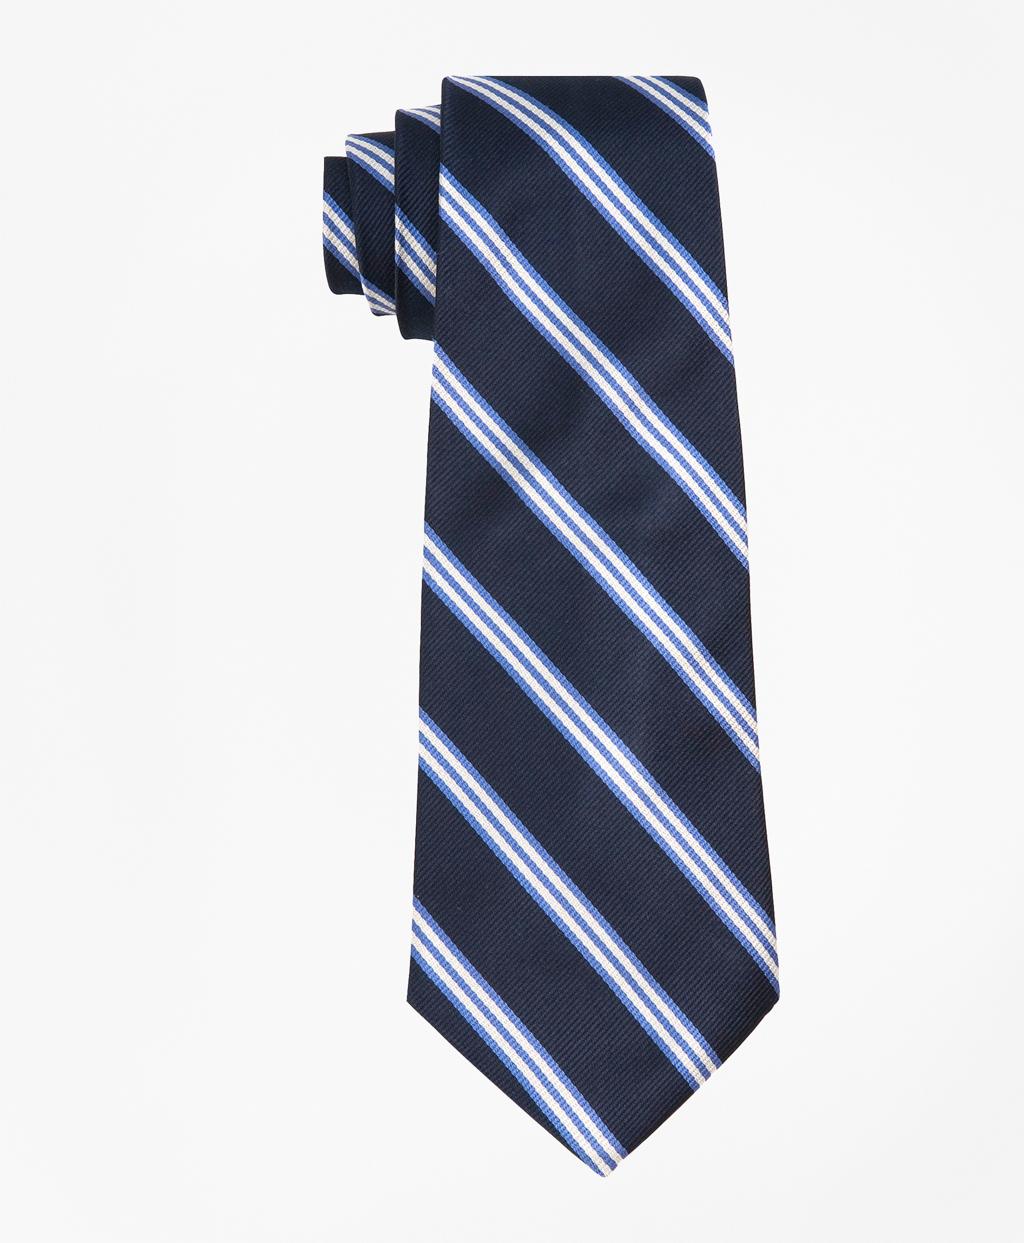 ring bearer blue white striped tie